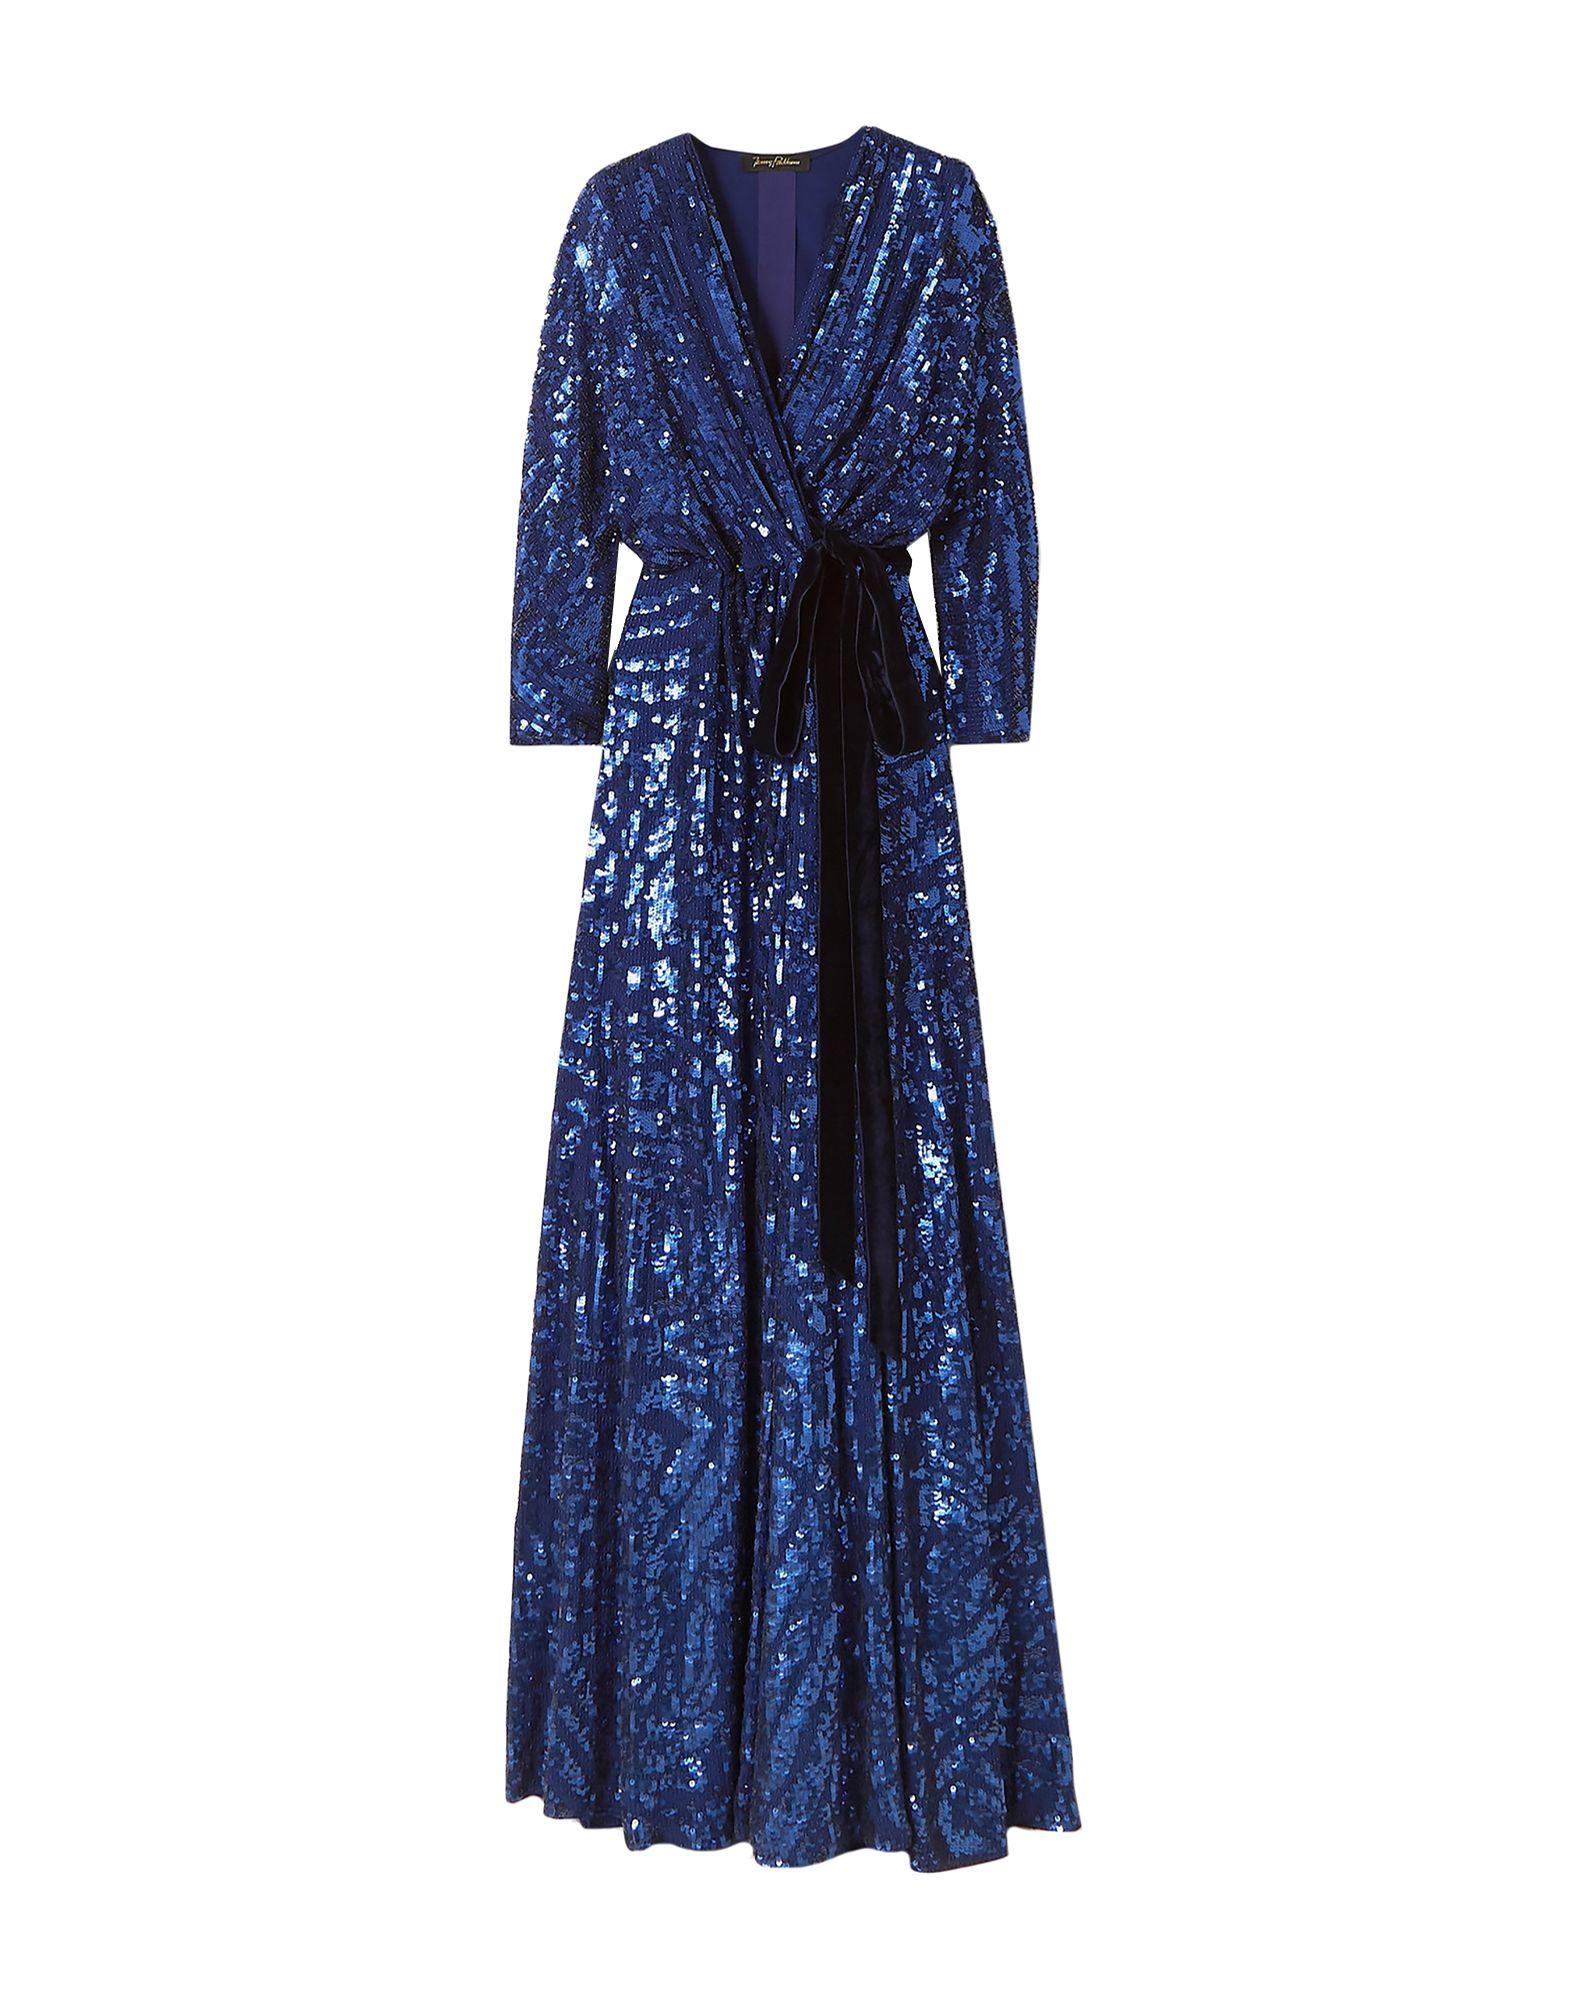 JENNY PACKHAM ジェニー・パッカム レディース ロングワンピース&ドレス ブルー